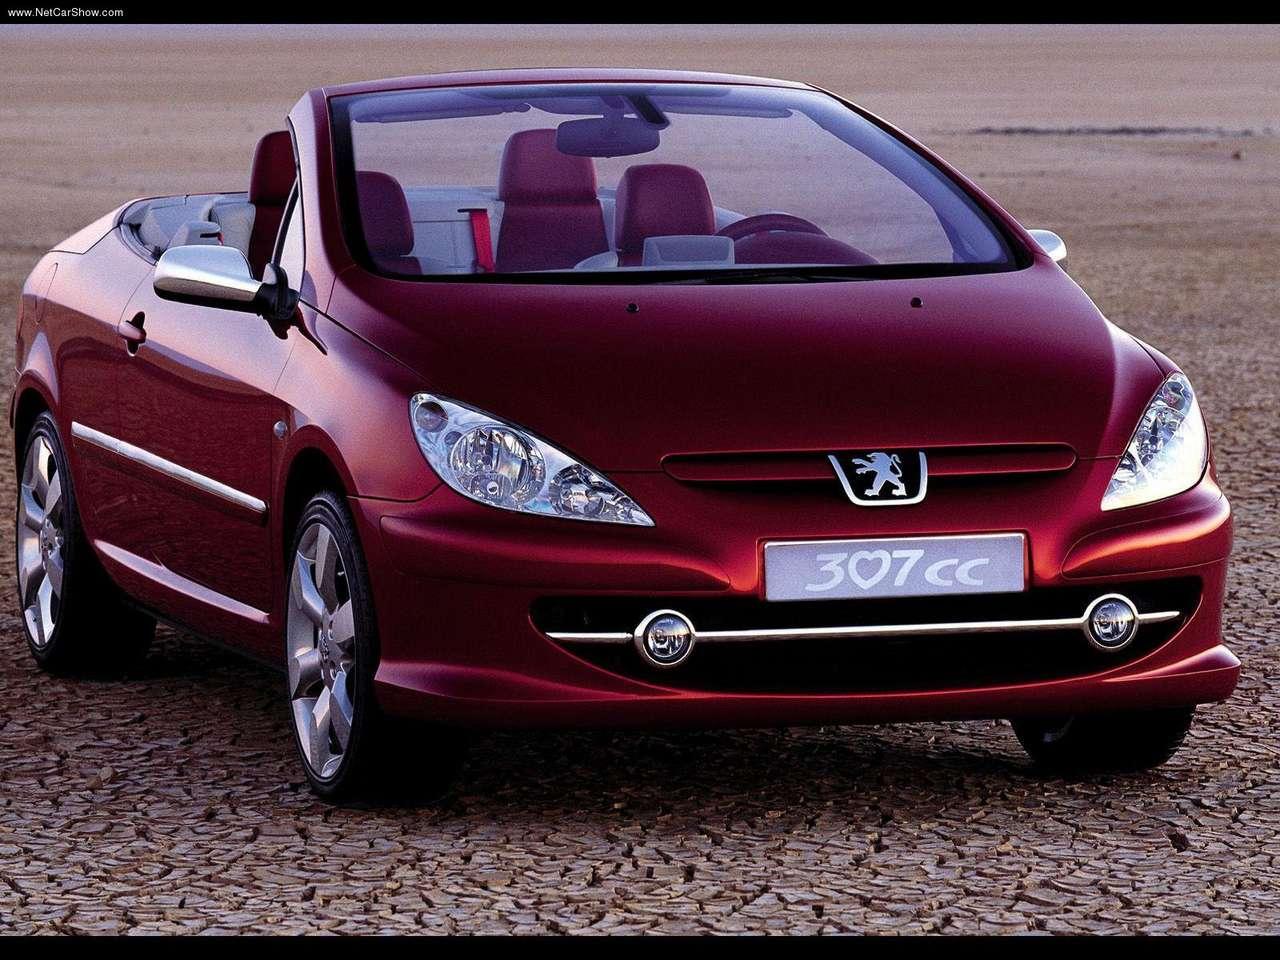 http://3.bp.blogspot.com/-9wAmx3kMRjw/TXs8uFldXsI/AAAAAAAANQQ/kWrjr_uzy9Q/s1600/Peugeot-307CC_Concept_2002_1280x960_wallpaper_03.jpg